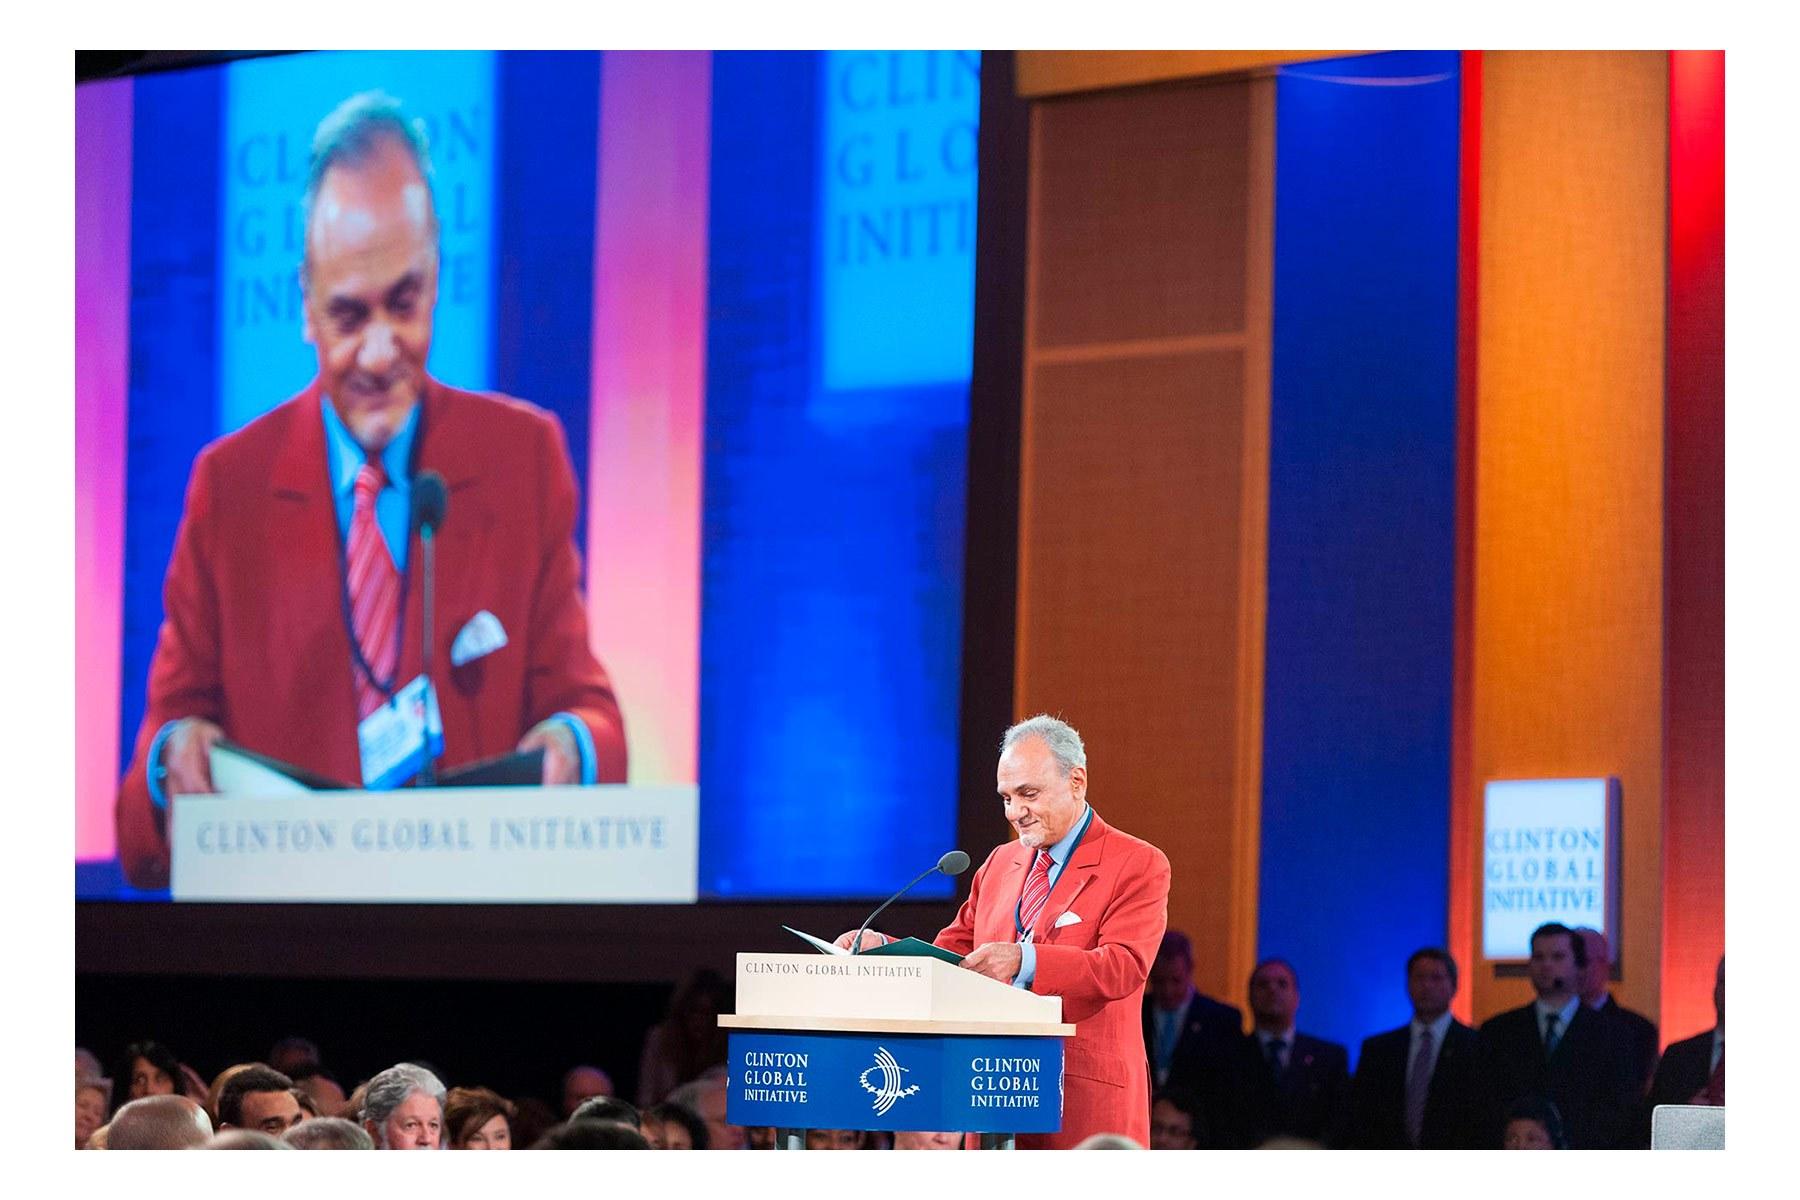 Prince Turki Al Faisal, Saud Saudi Arabia, Closing Plenary, Clinton Global Initiative, CGI 2012 meetings, Designing for Impact, New York, September 2012